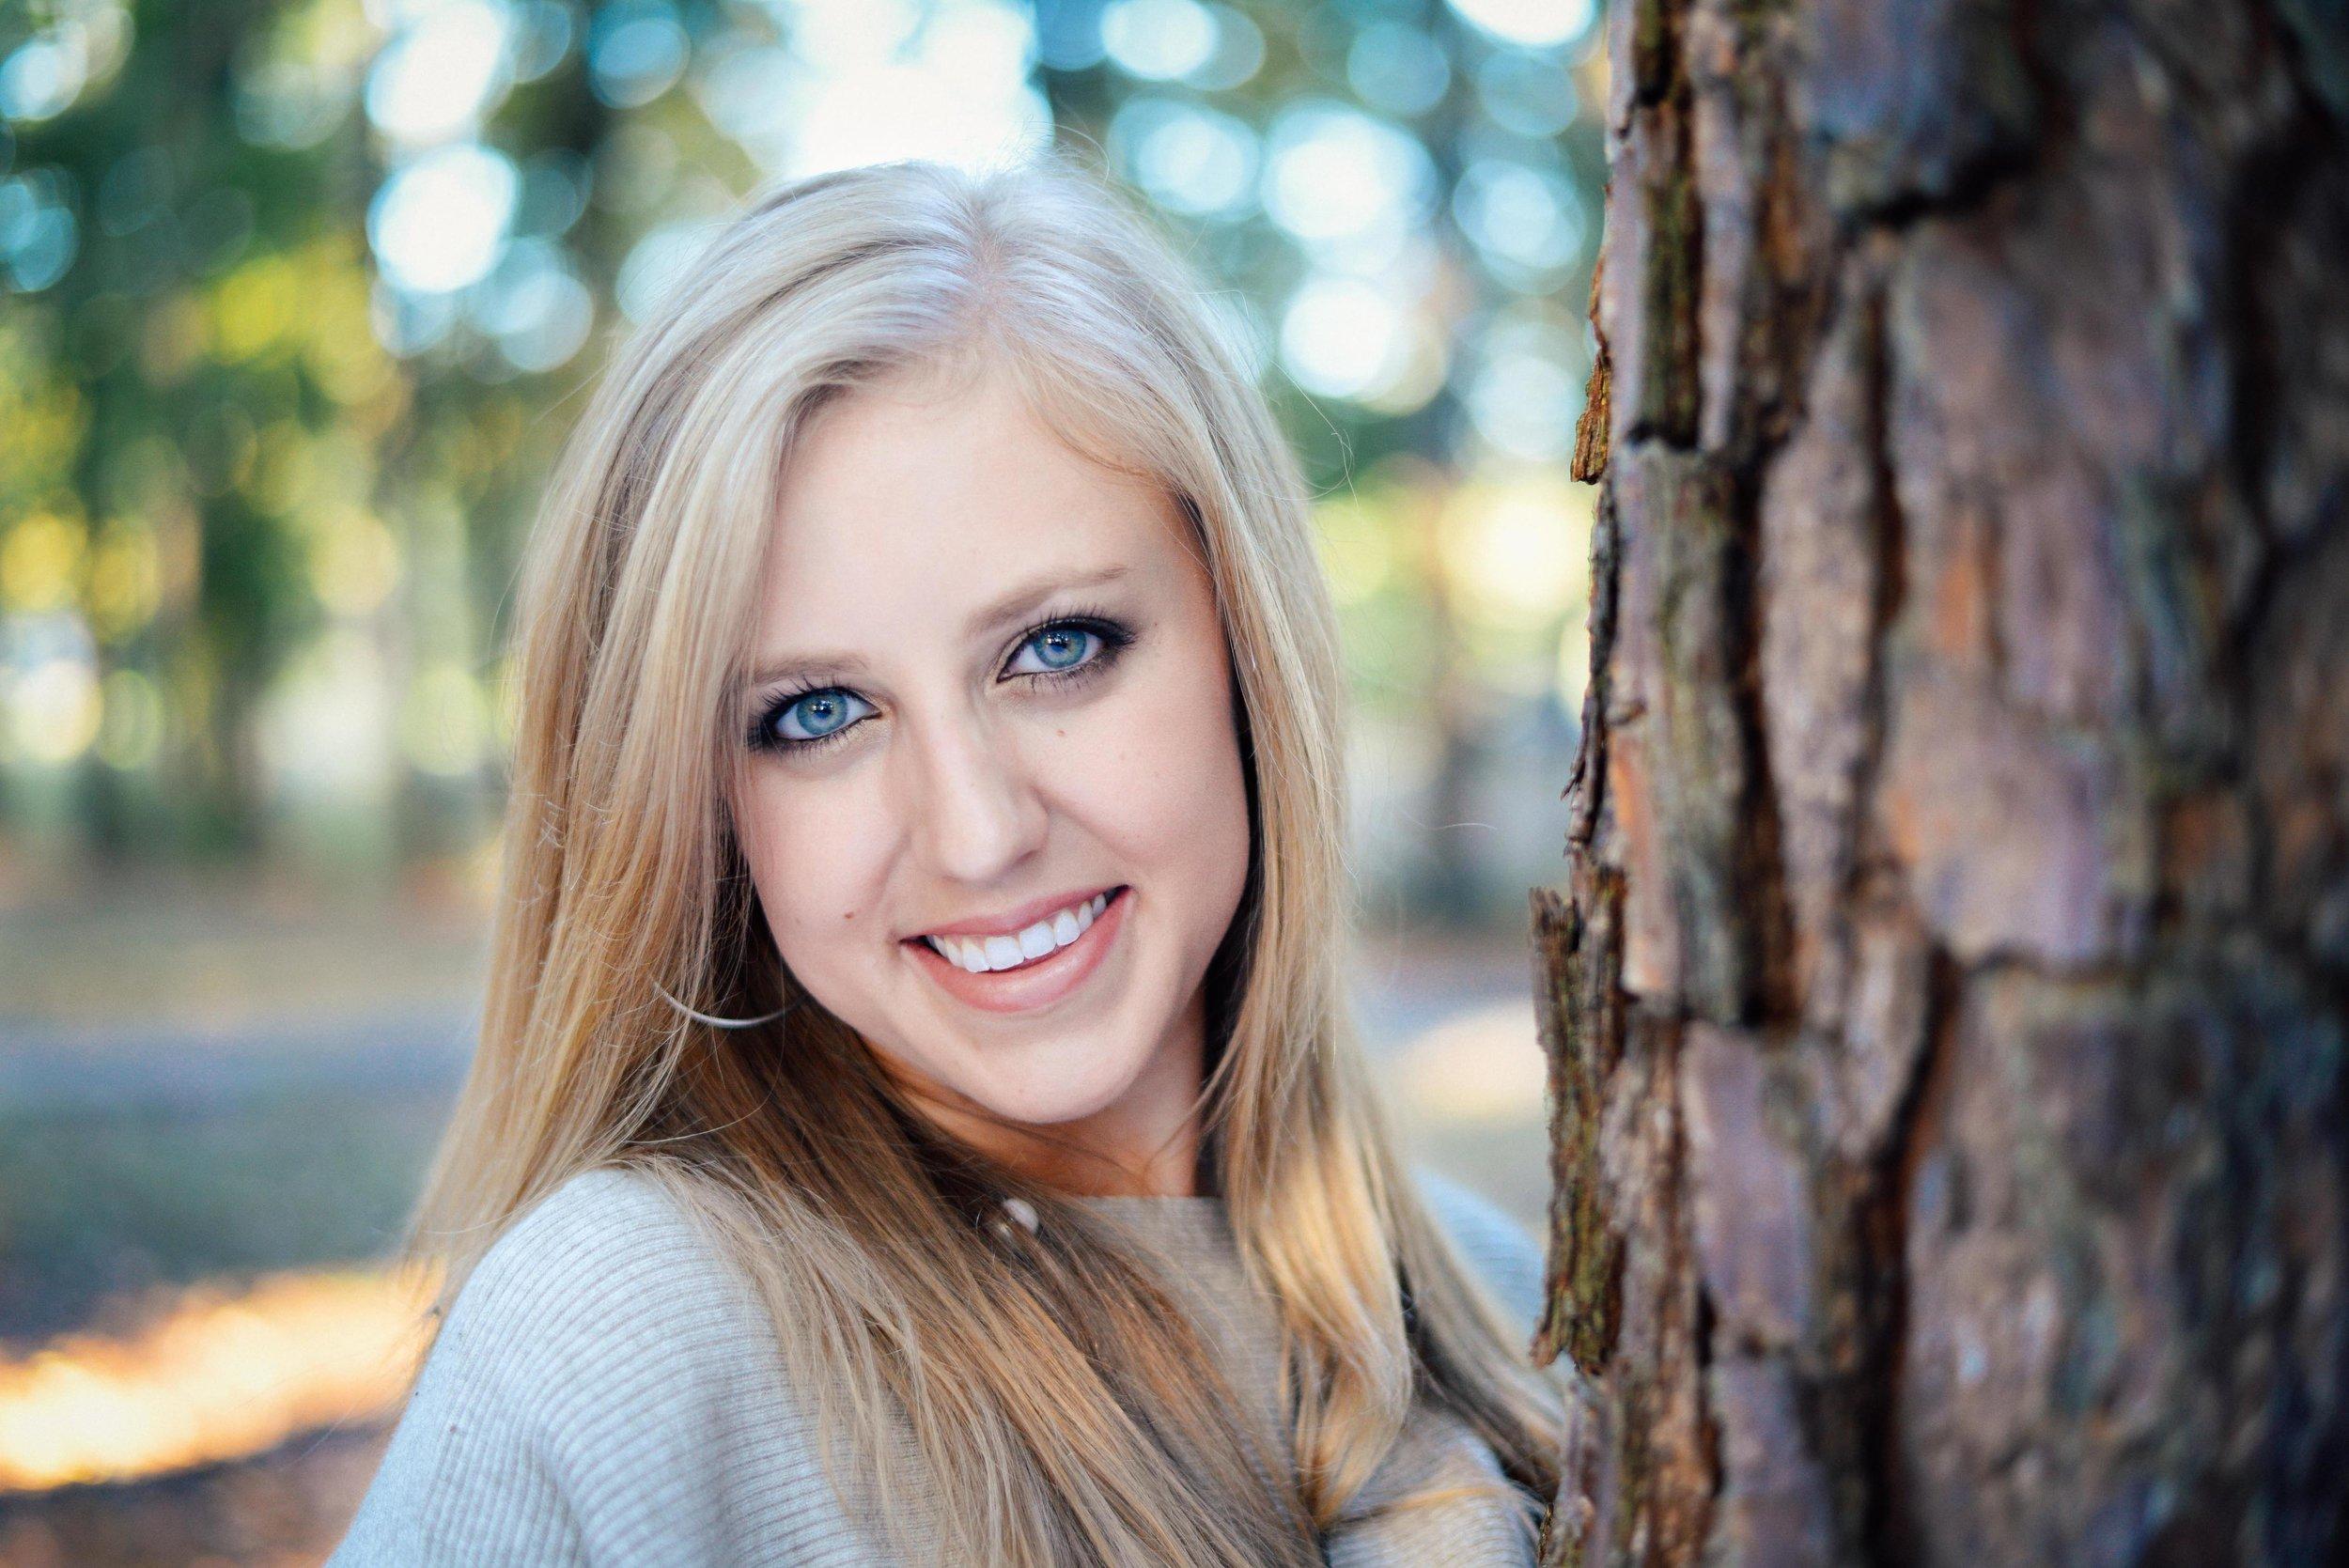 blonde girl leaning against tree